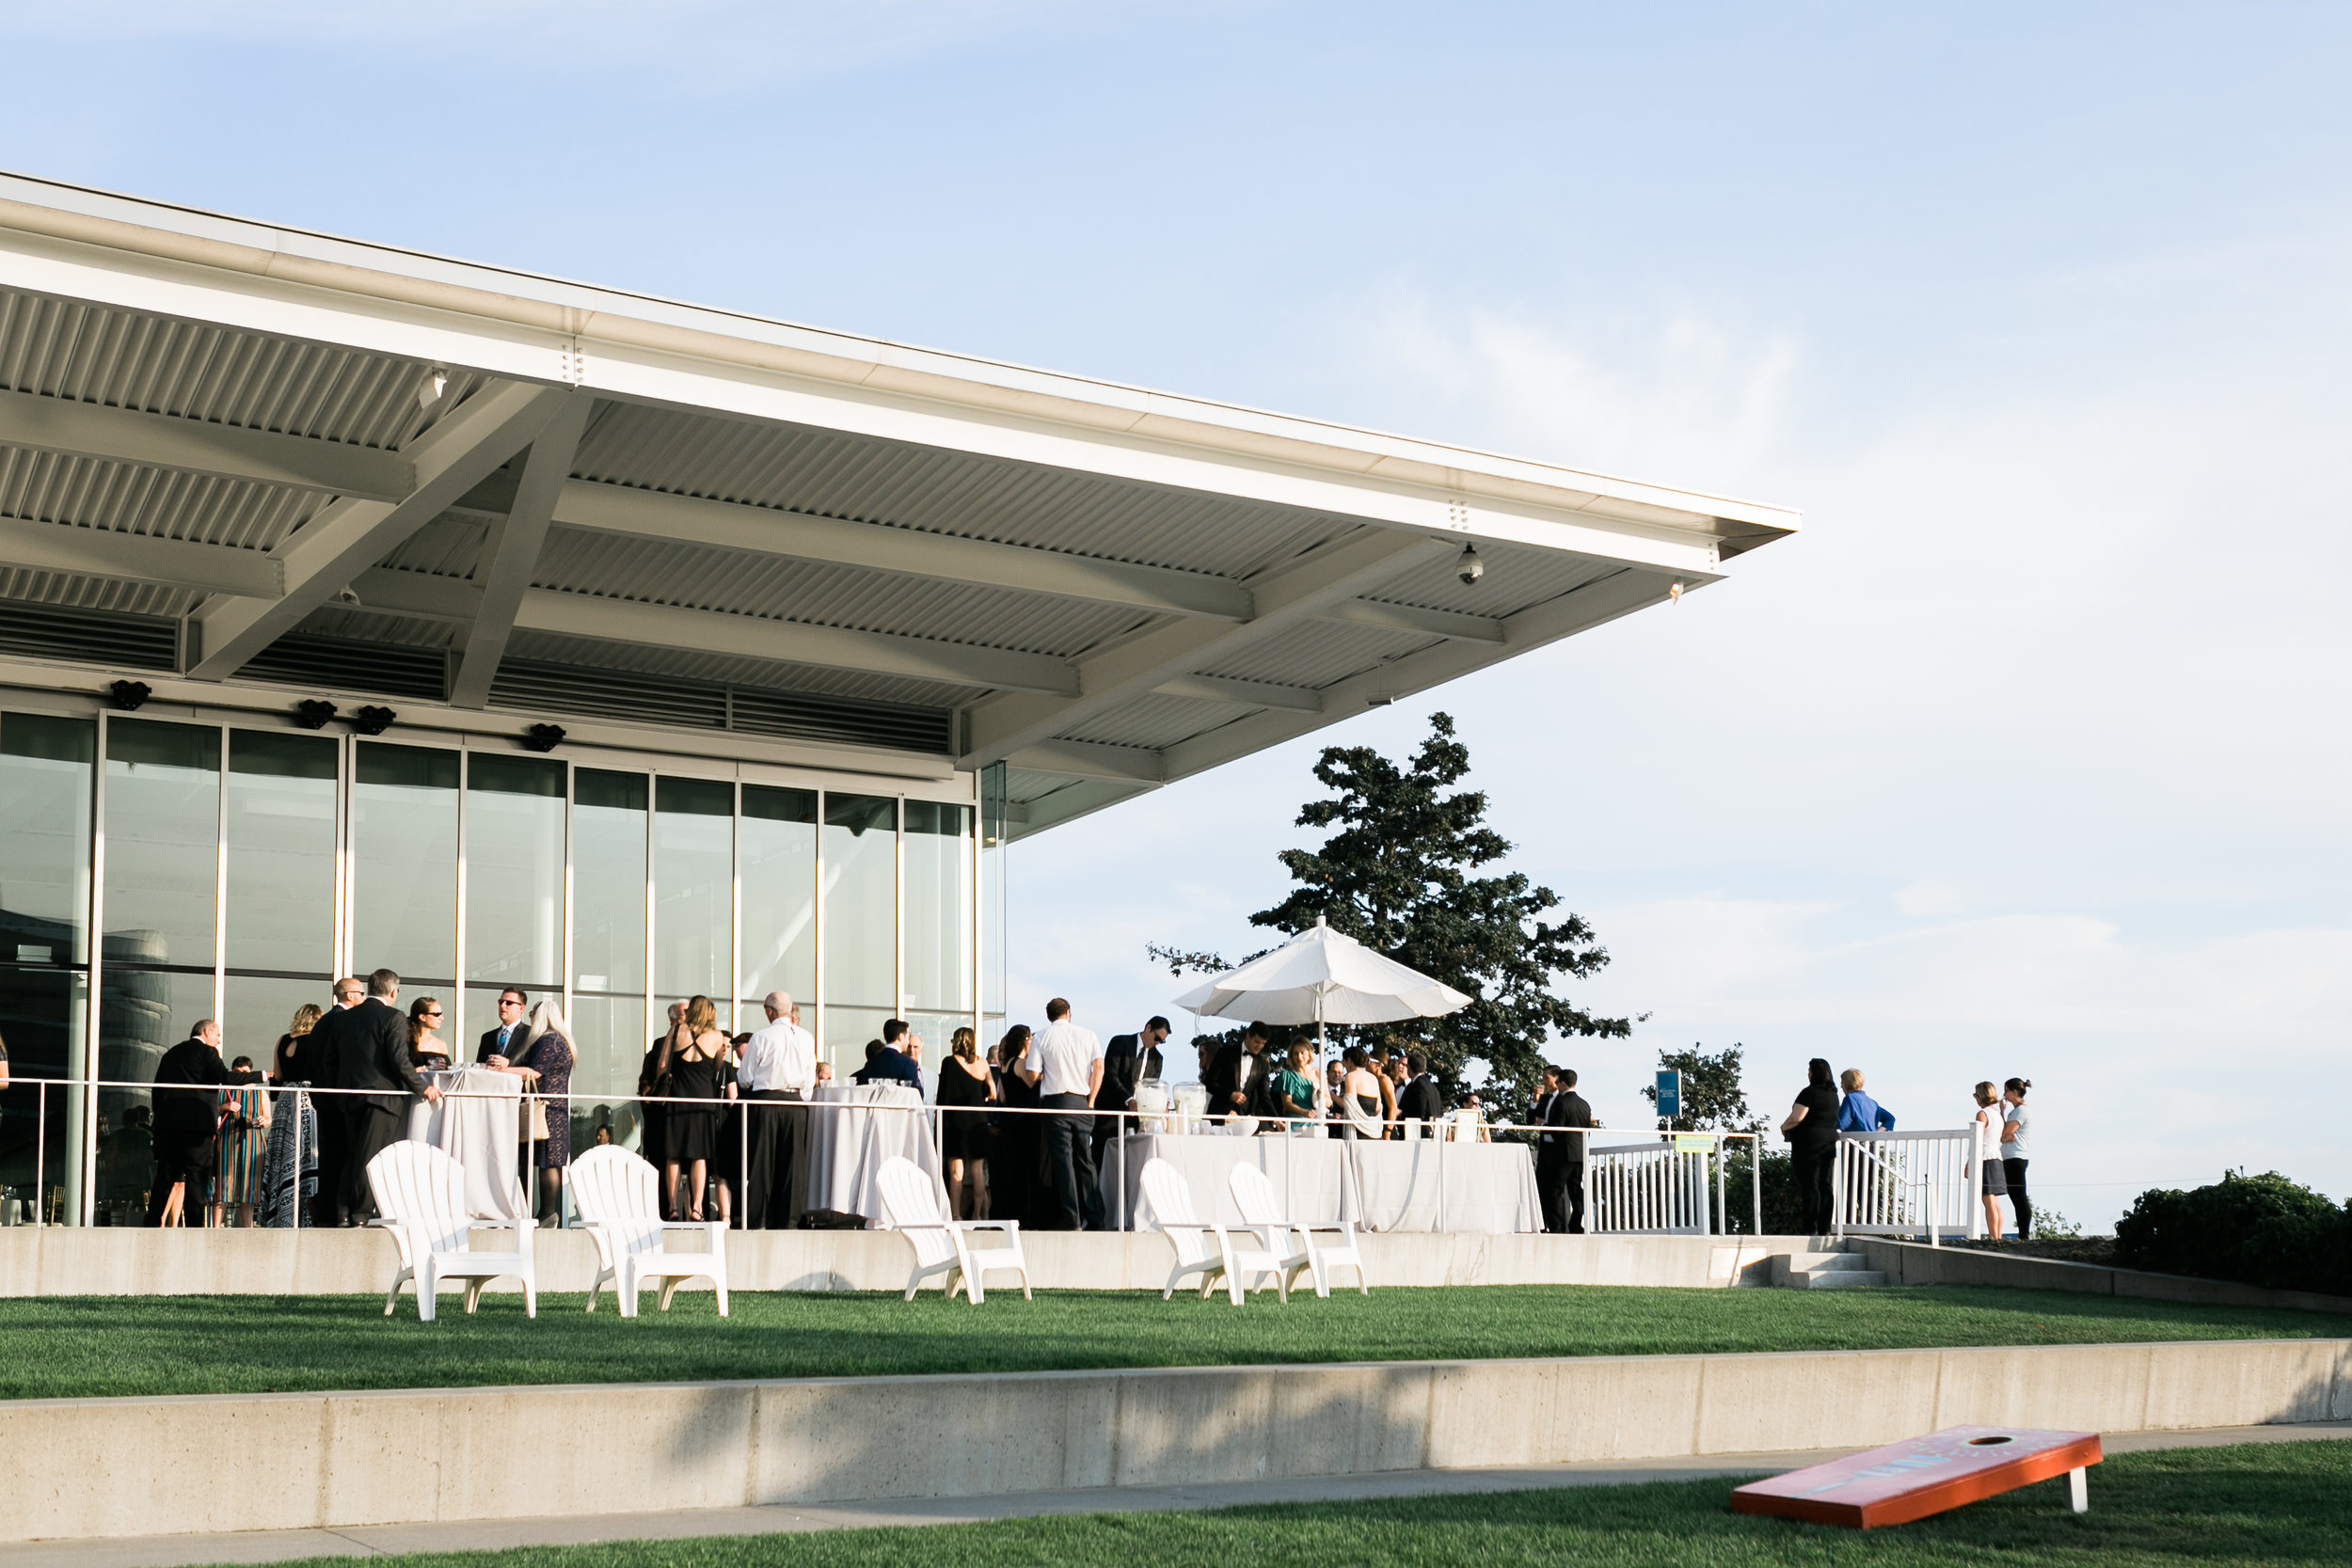 seattle-wedding-olympic sculpture park-outdoors-northwest-modern